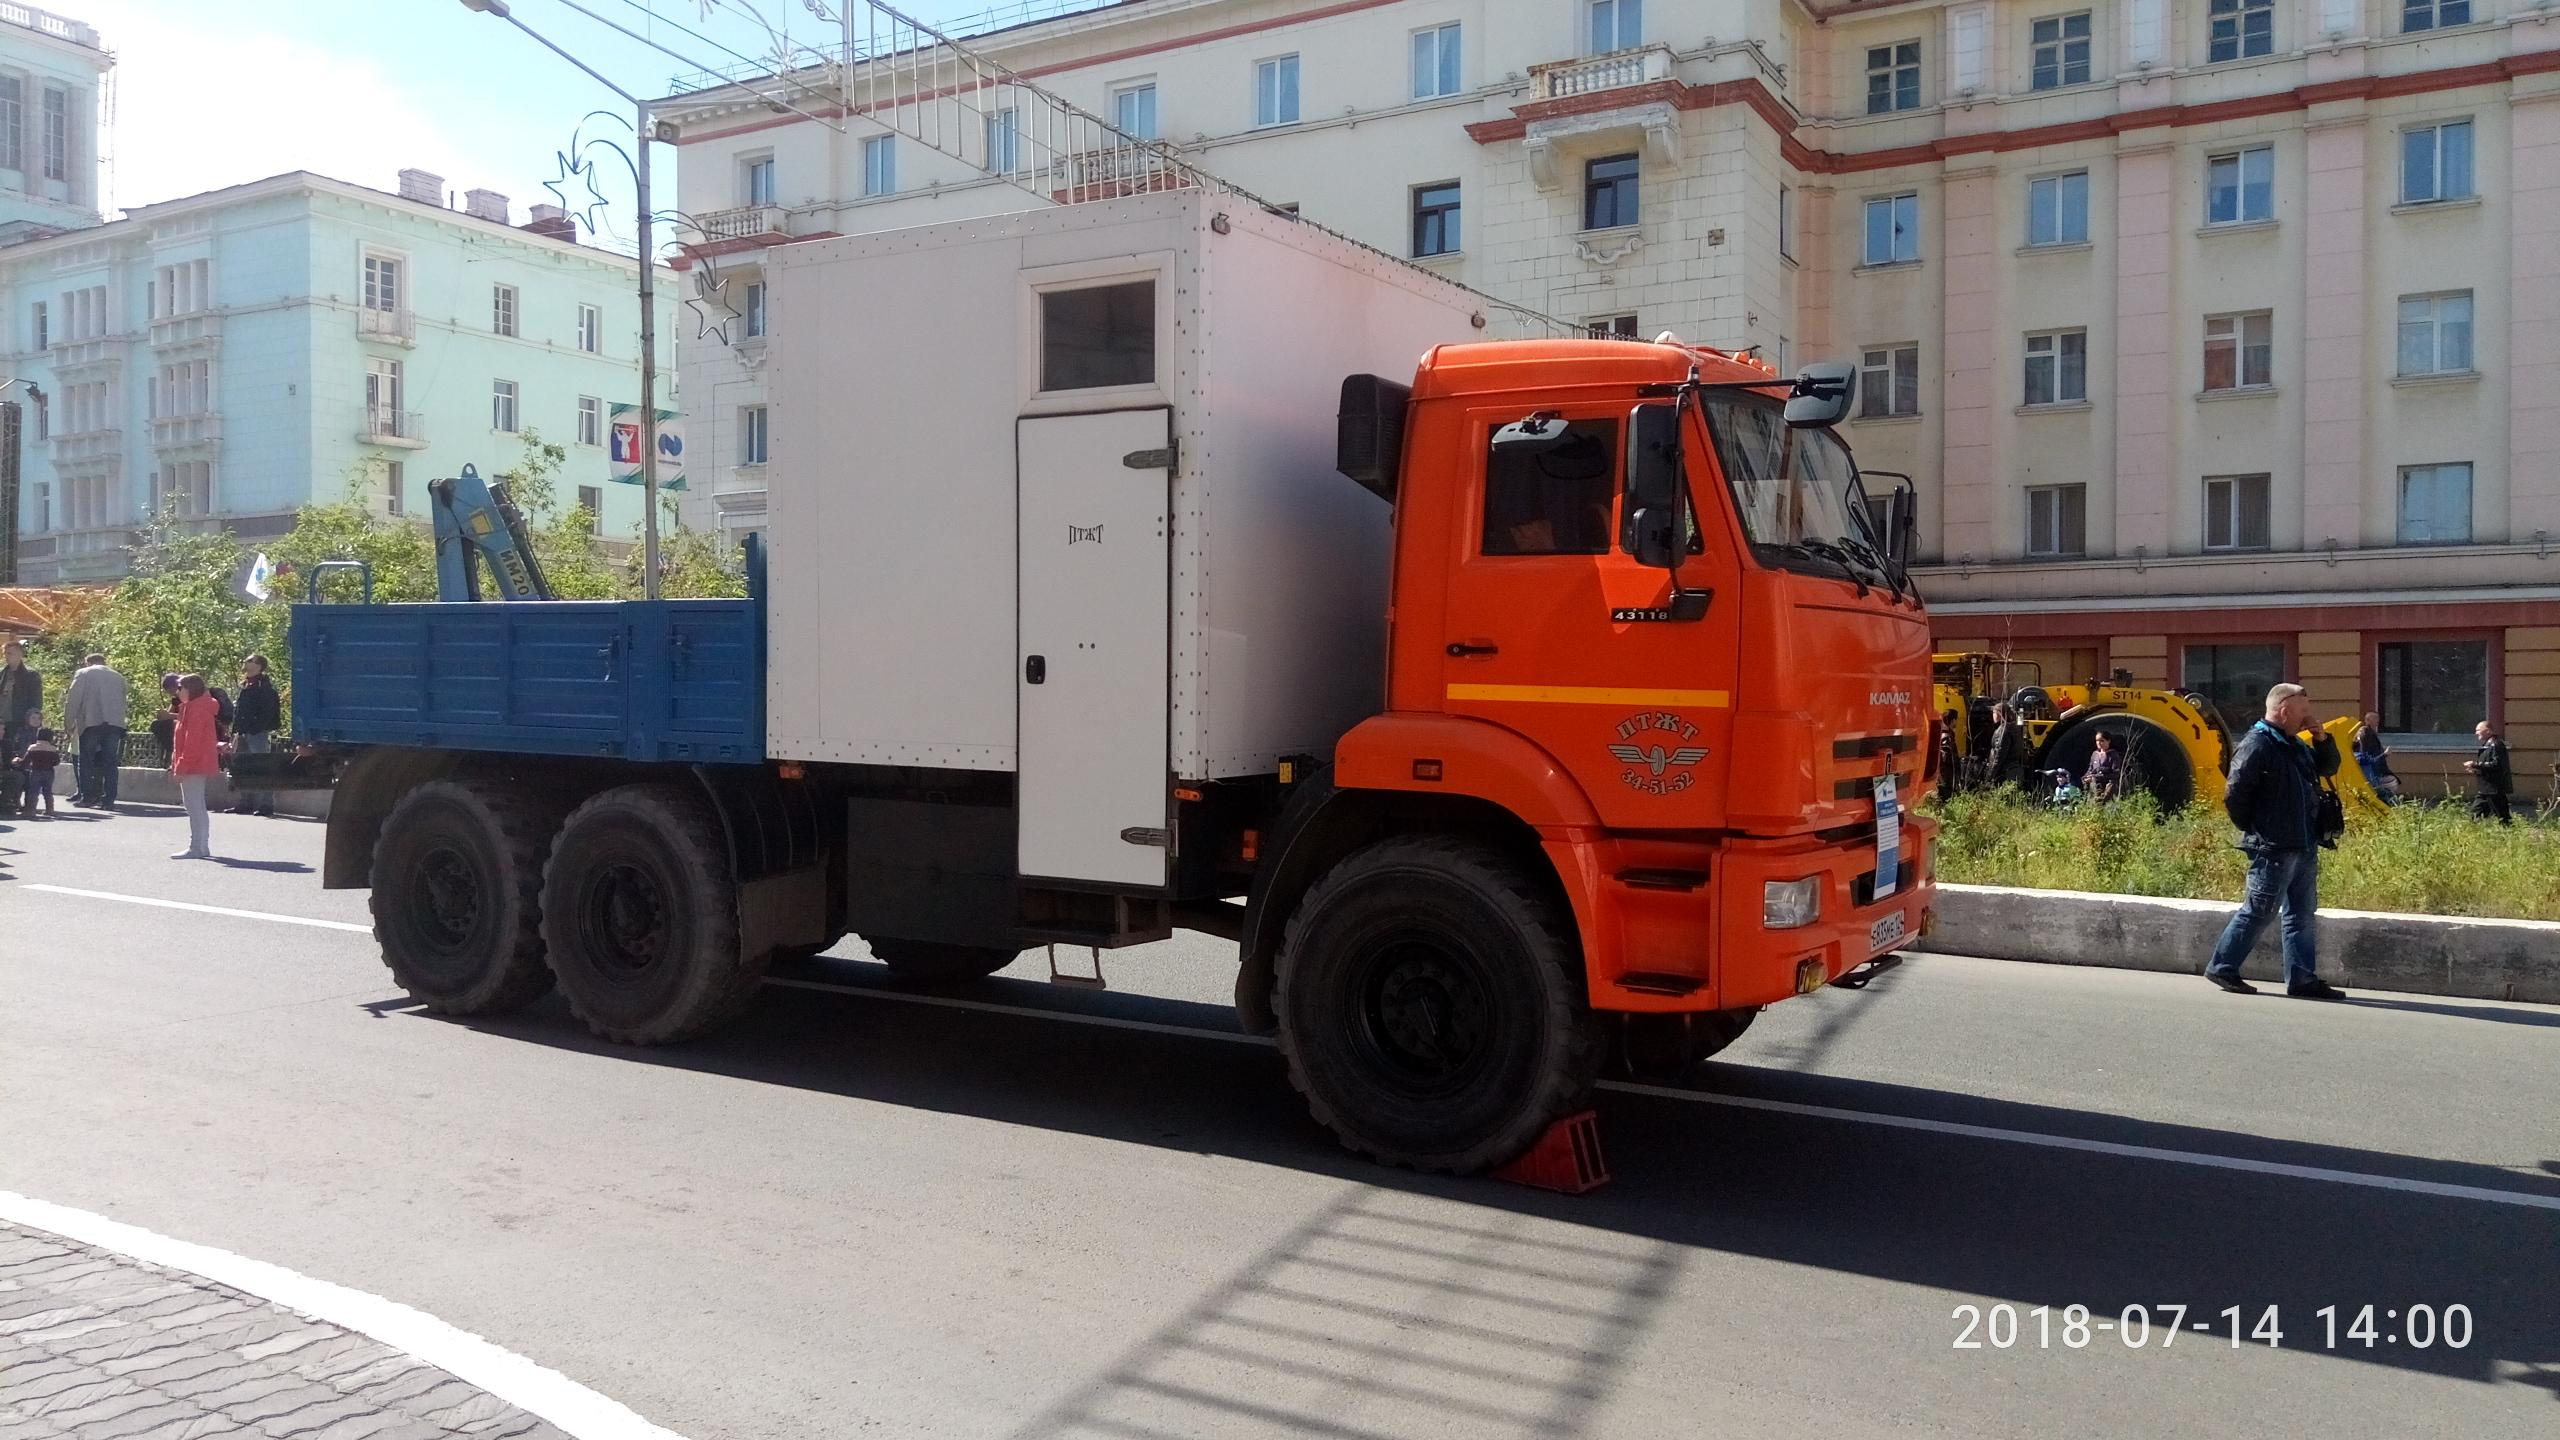 P80714-140031.jpg